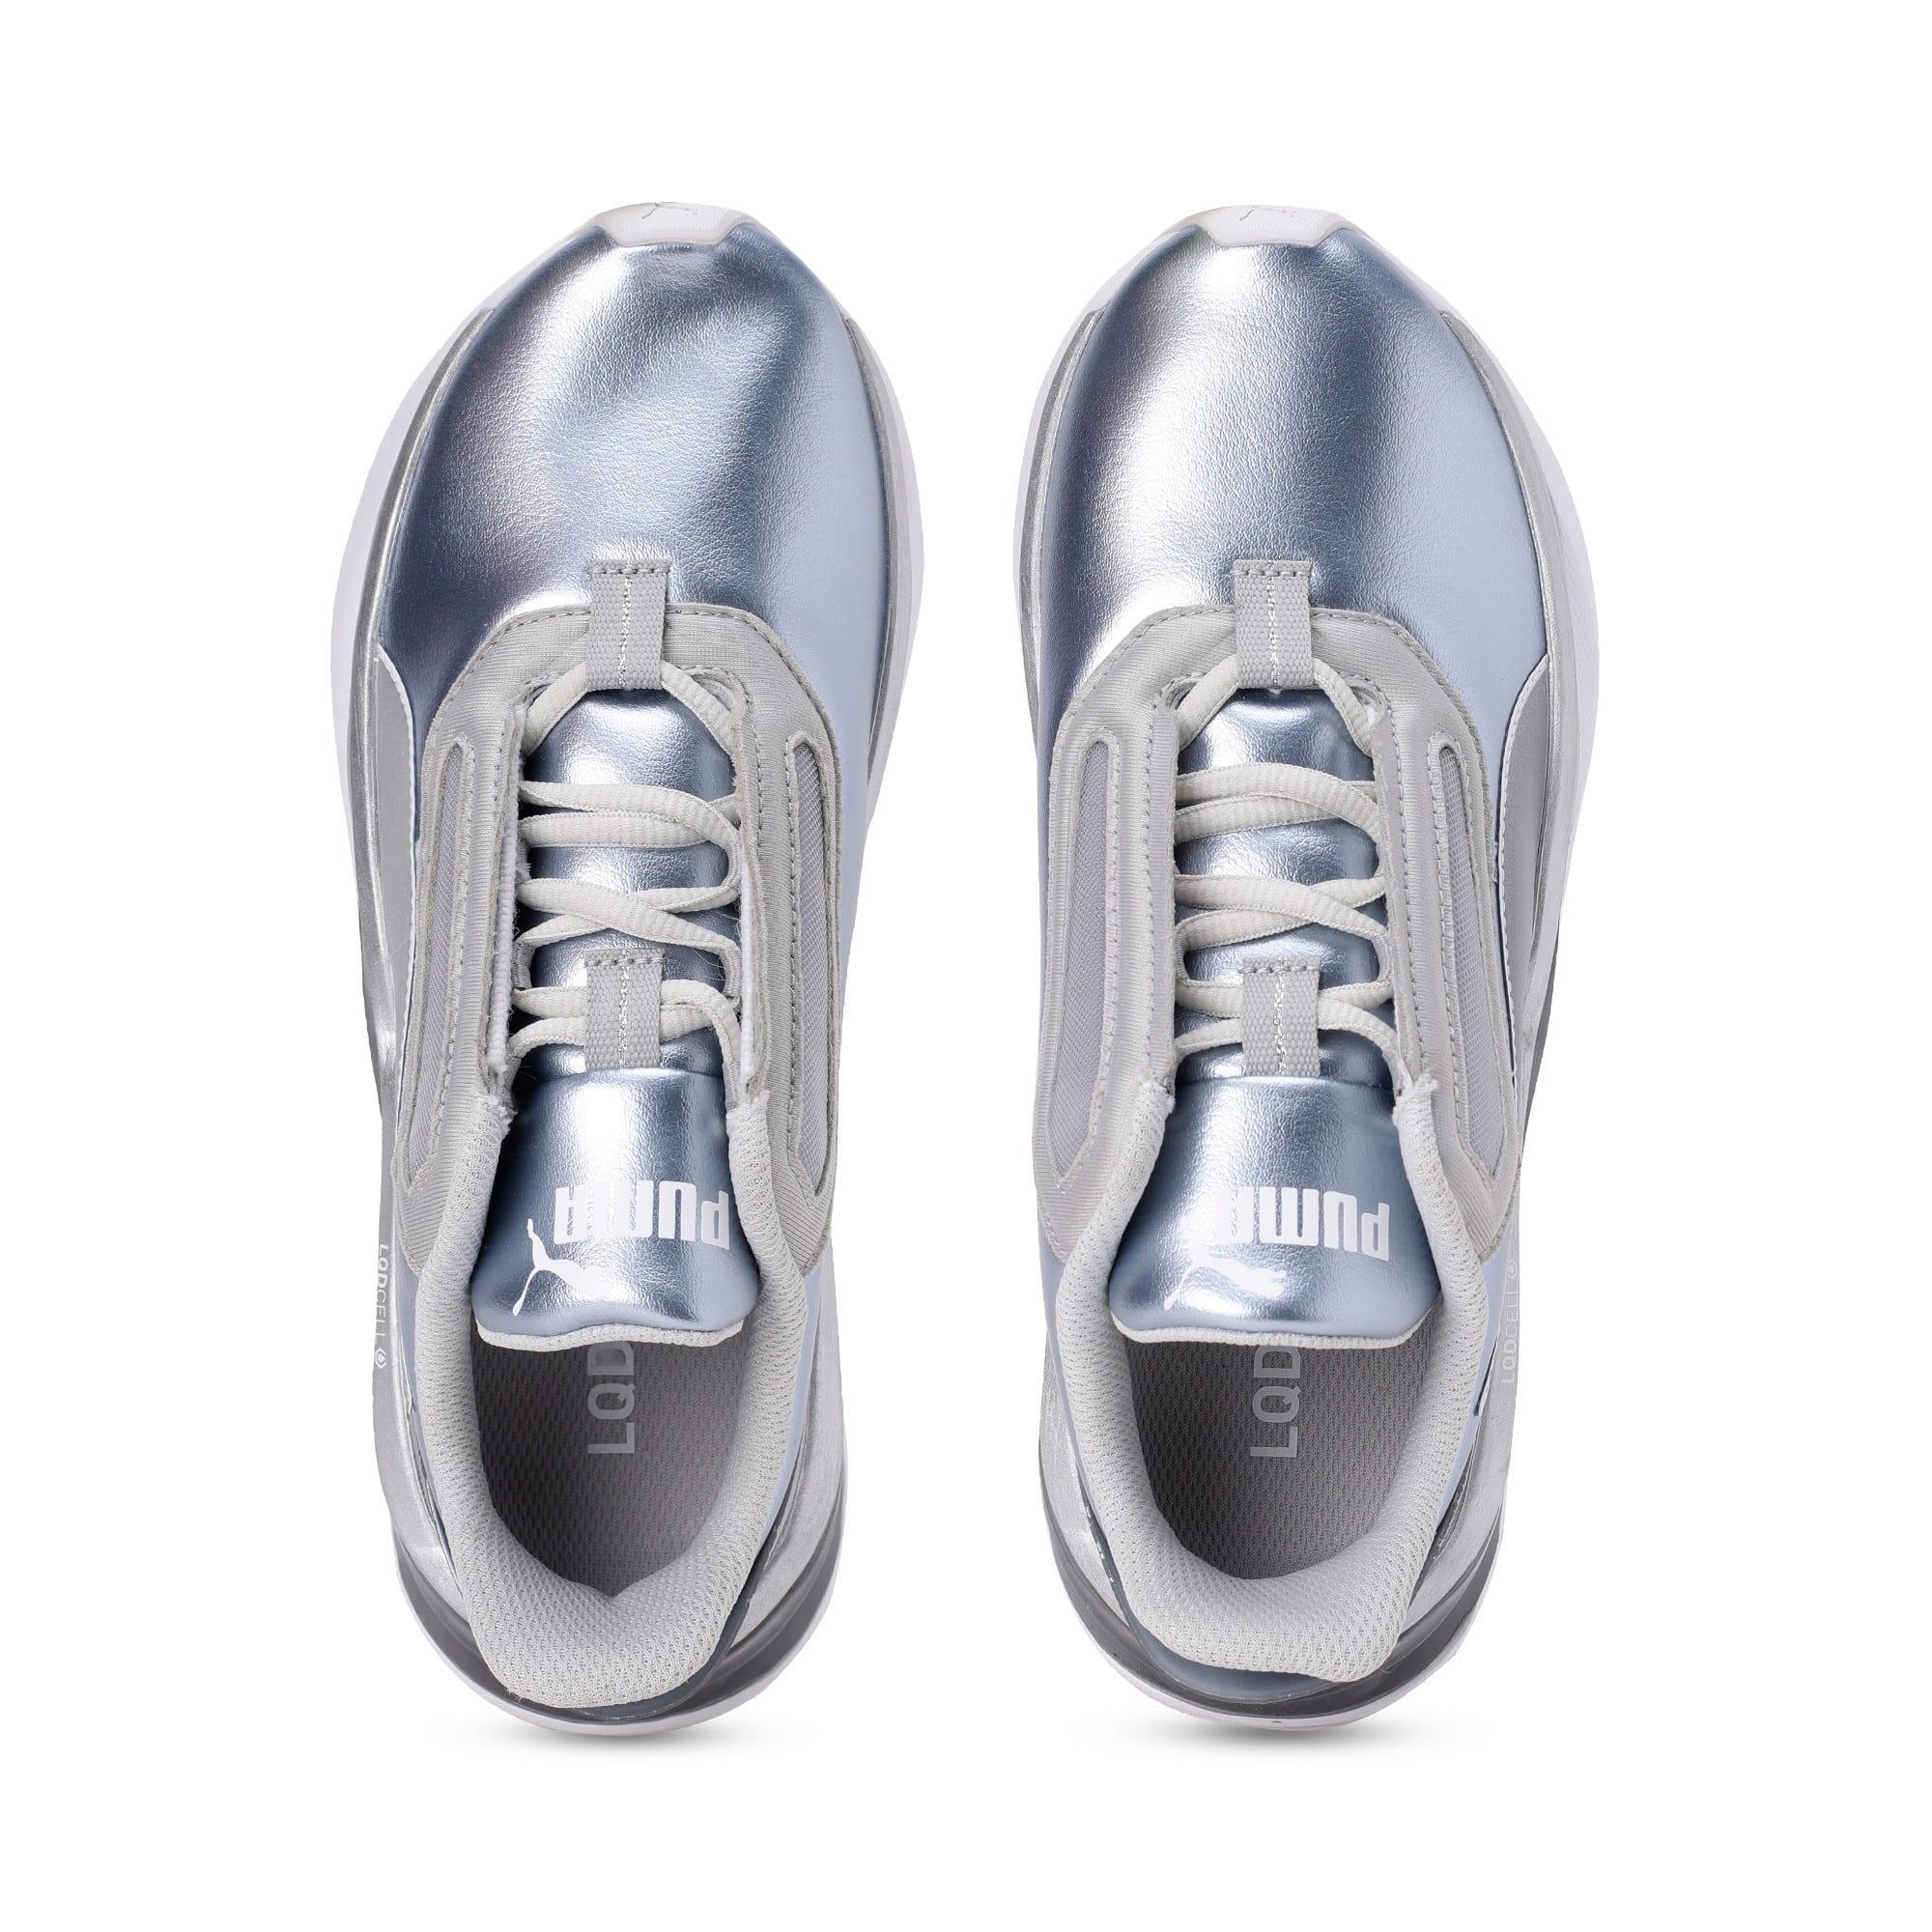 Thumbnail 6 of LQDCELL Shatter XT Metal Women's Training Shoes, Puma Silver-Puma White, medium